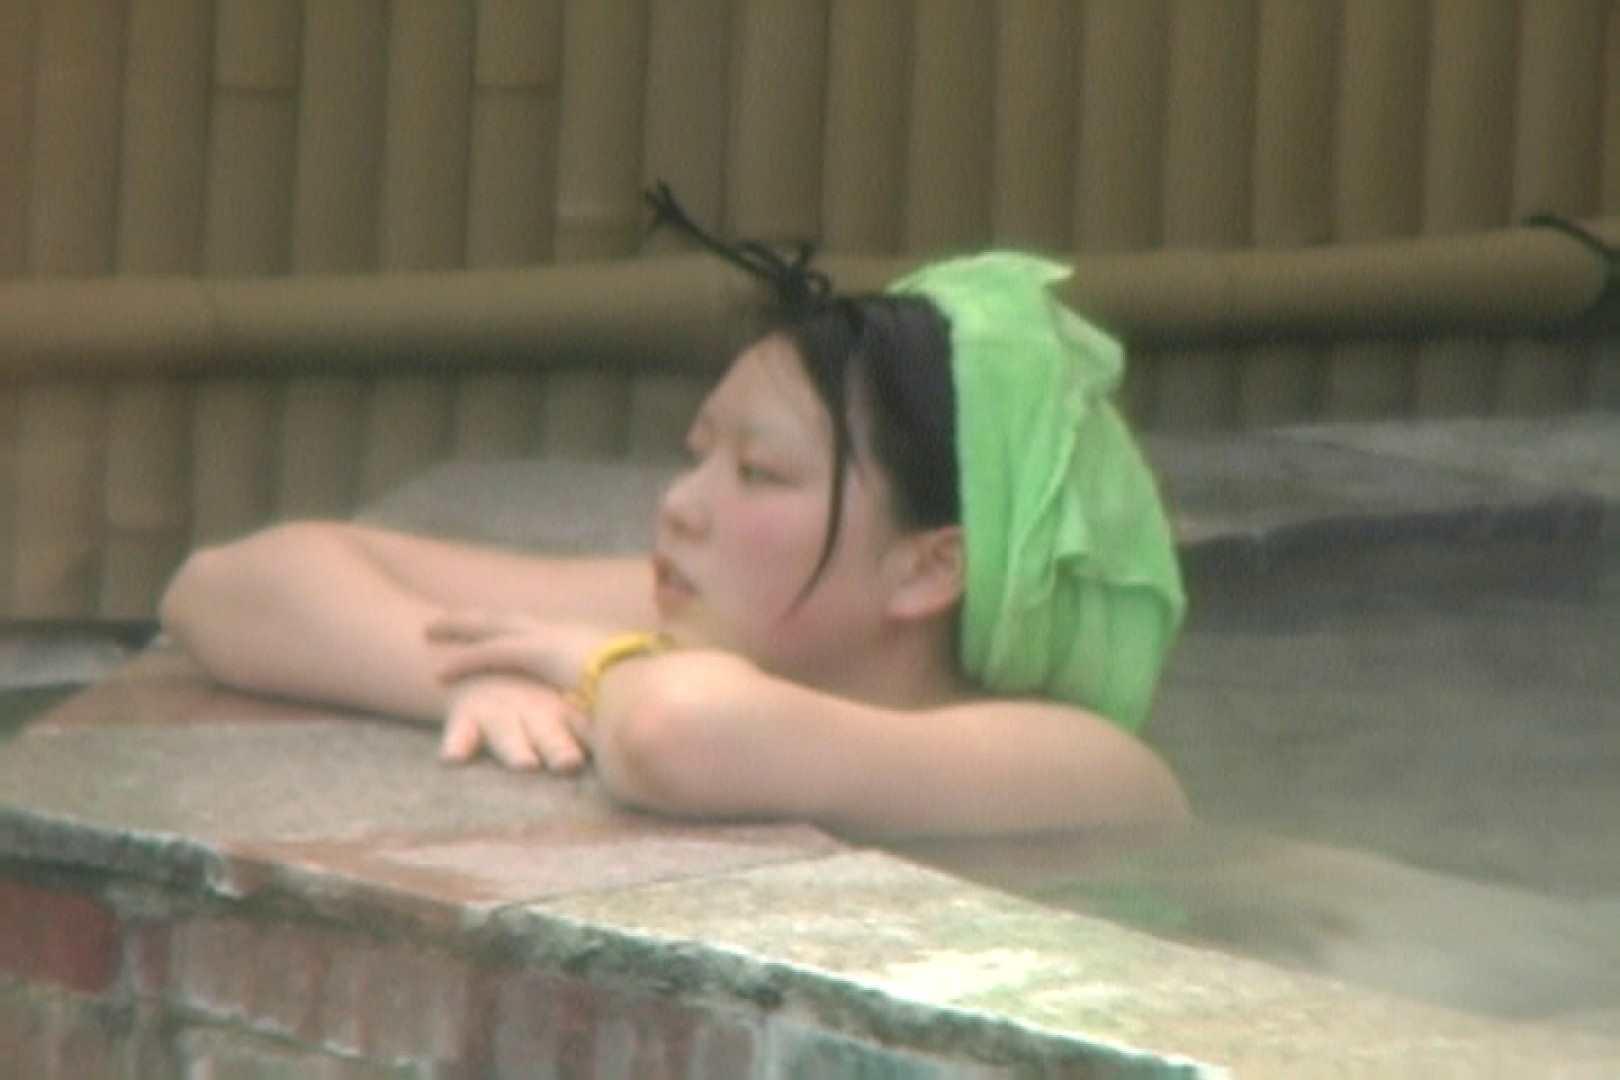 Aquaな露天風呂Vol.563 OLセックス 盗撮動画紹介 92画像 26